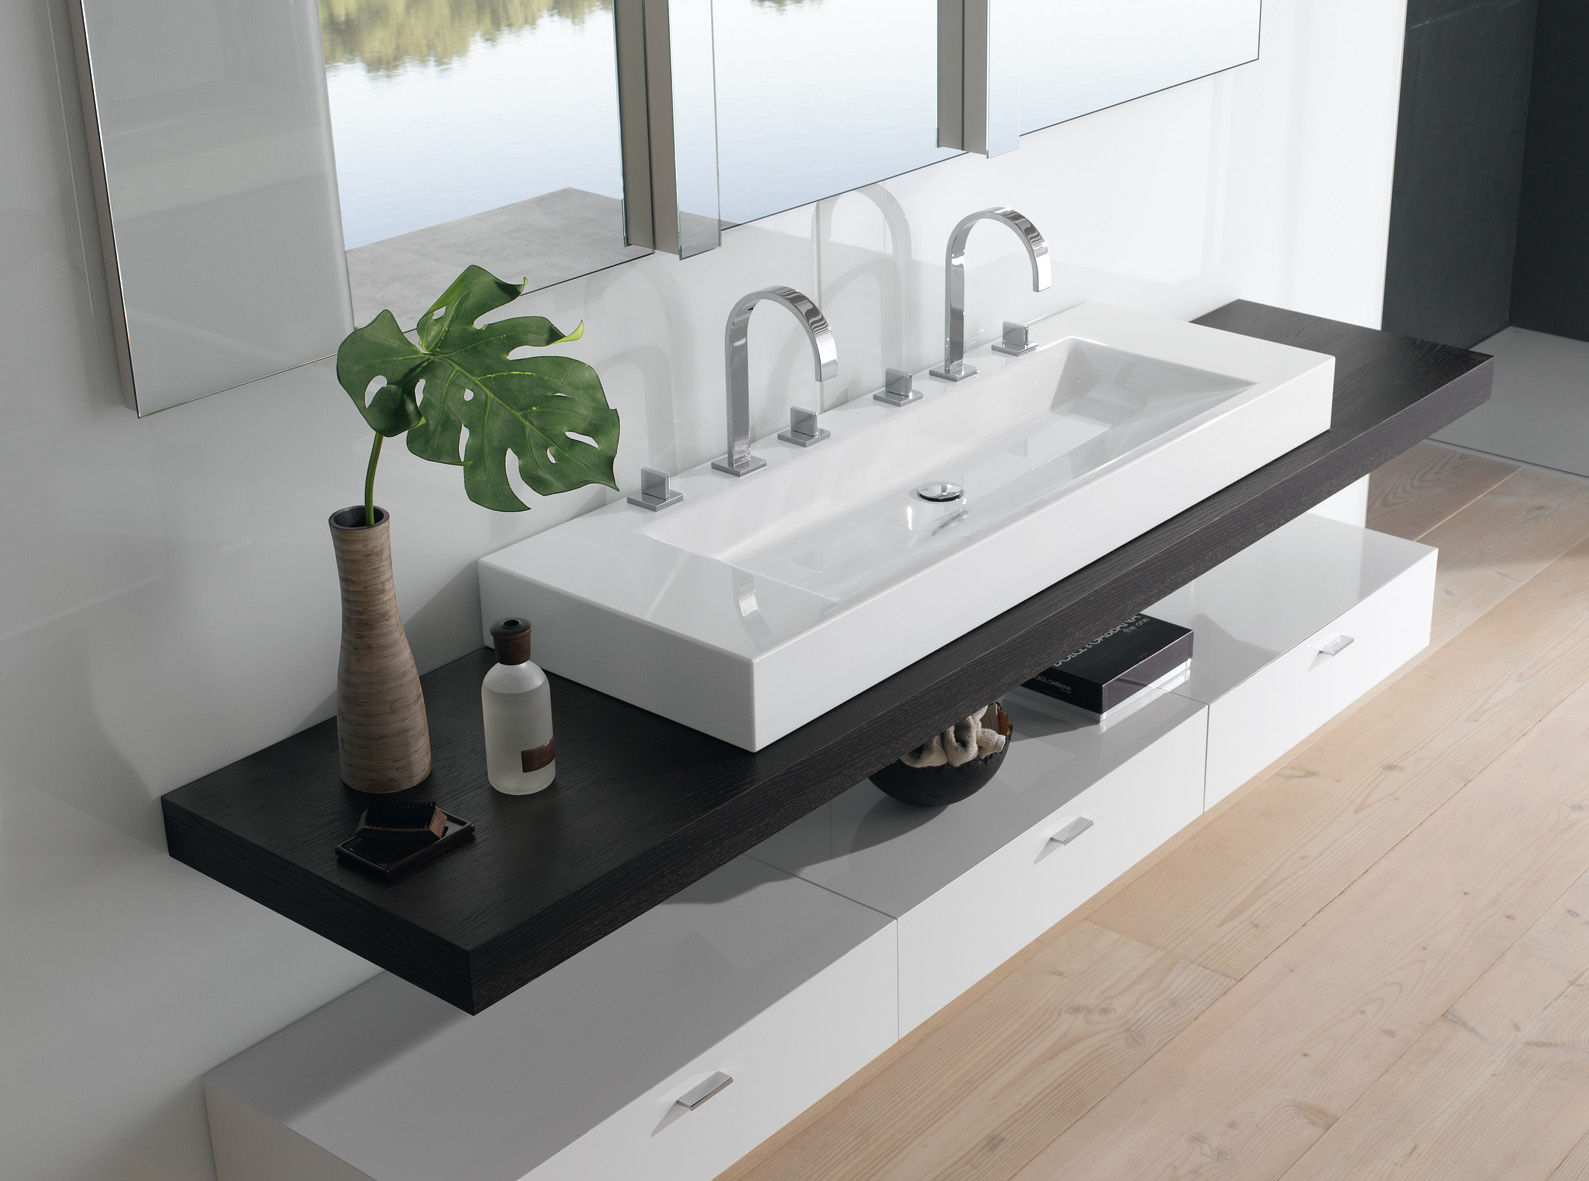 Wastafels Startpagina voor badkamer ideeën  UW-badkamer.nl